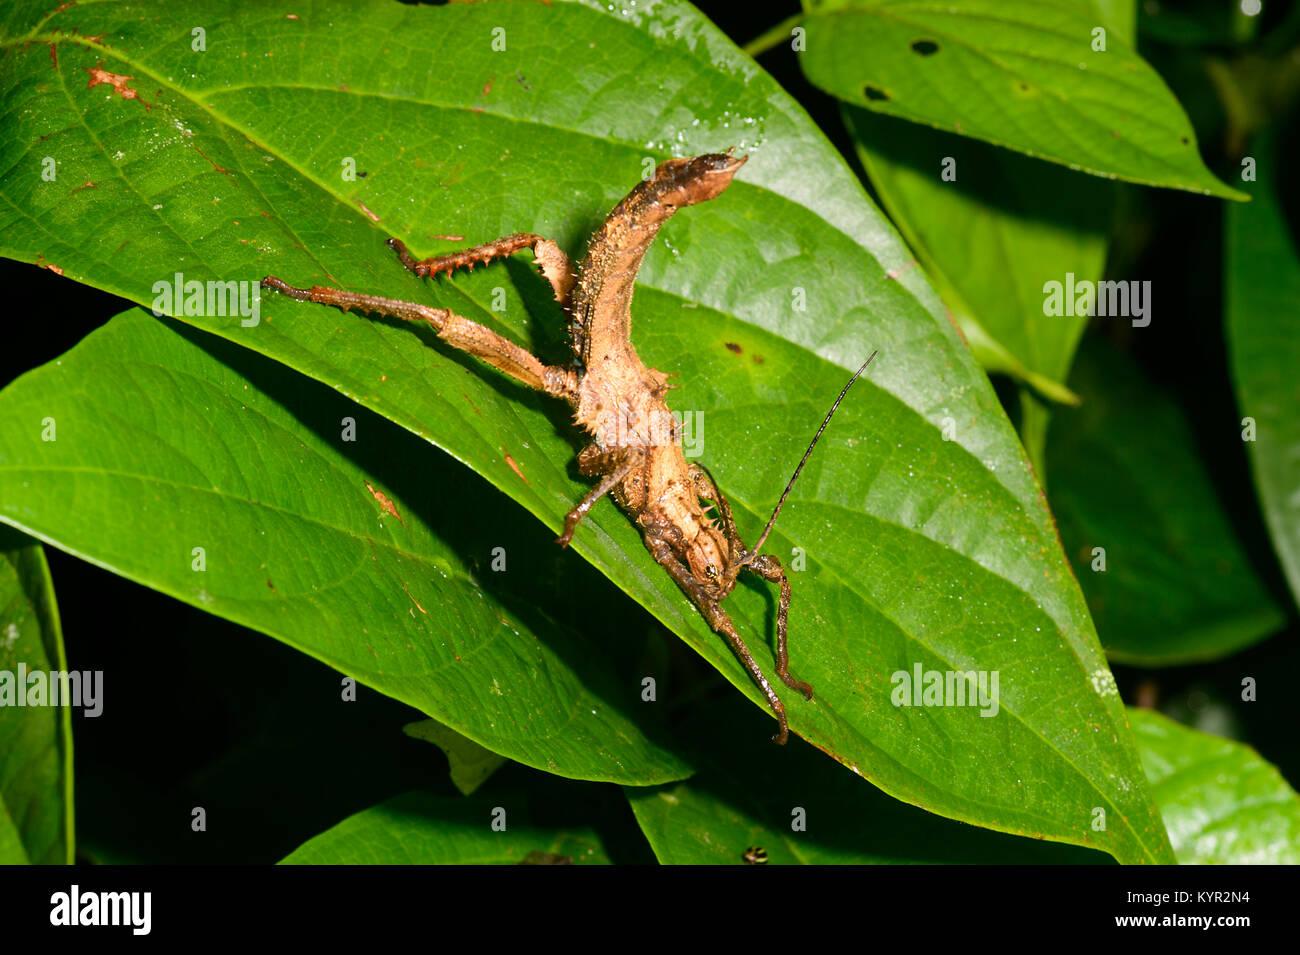 Nahaufnahme einer Thorny Stick Insect (Aretaon asperrimus) in Gefahr bringen, Tabin, Borneo, Sabah, Malaysia Stockbild